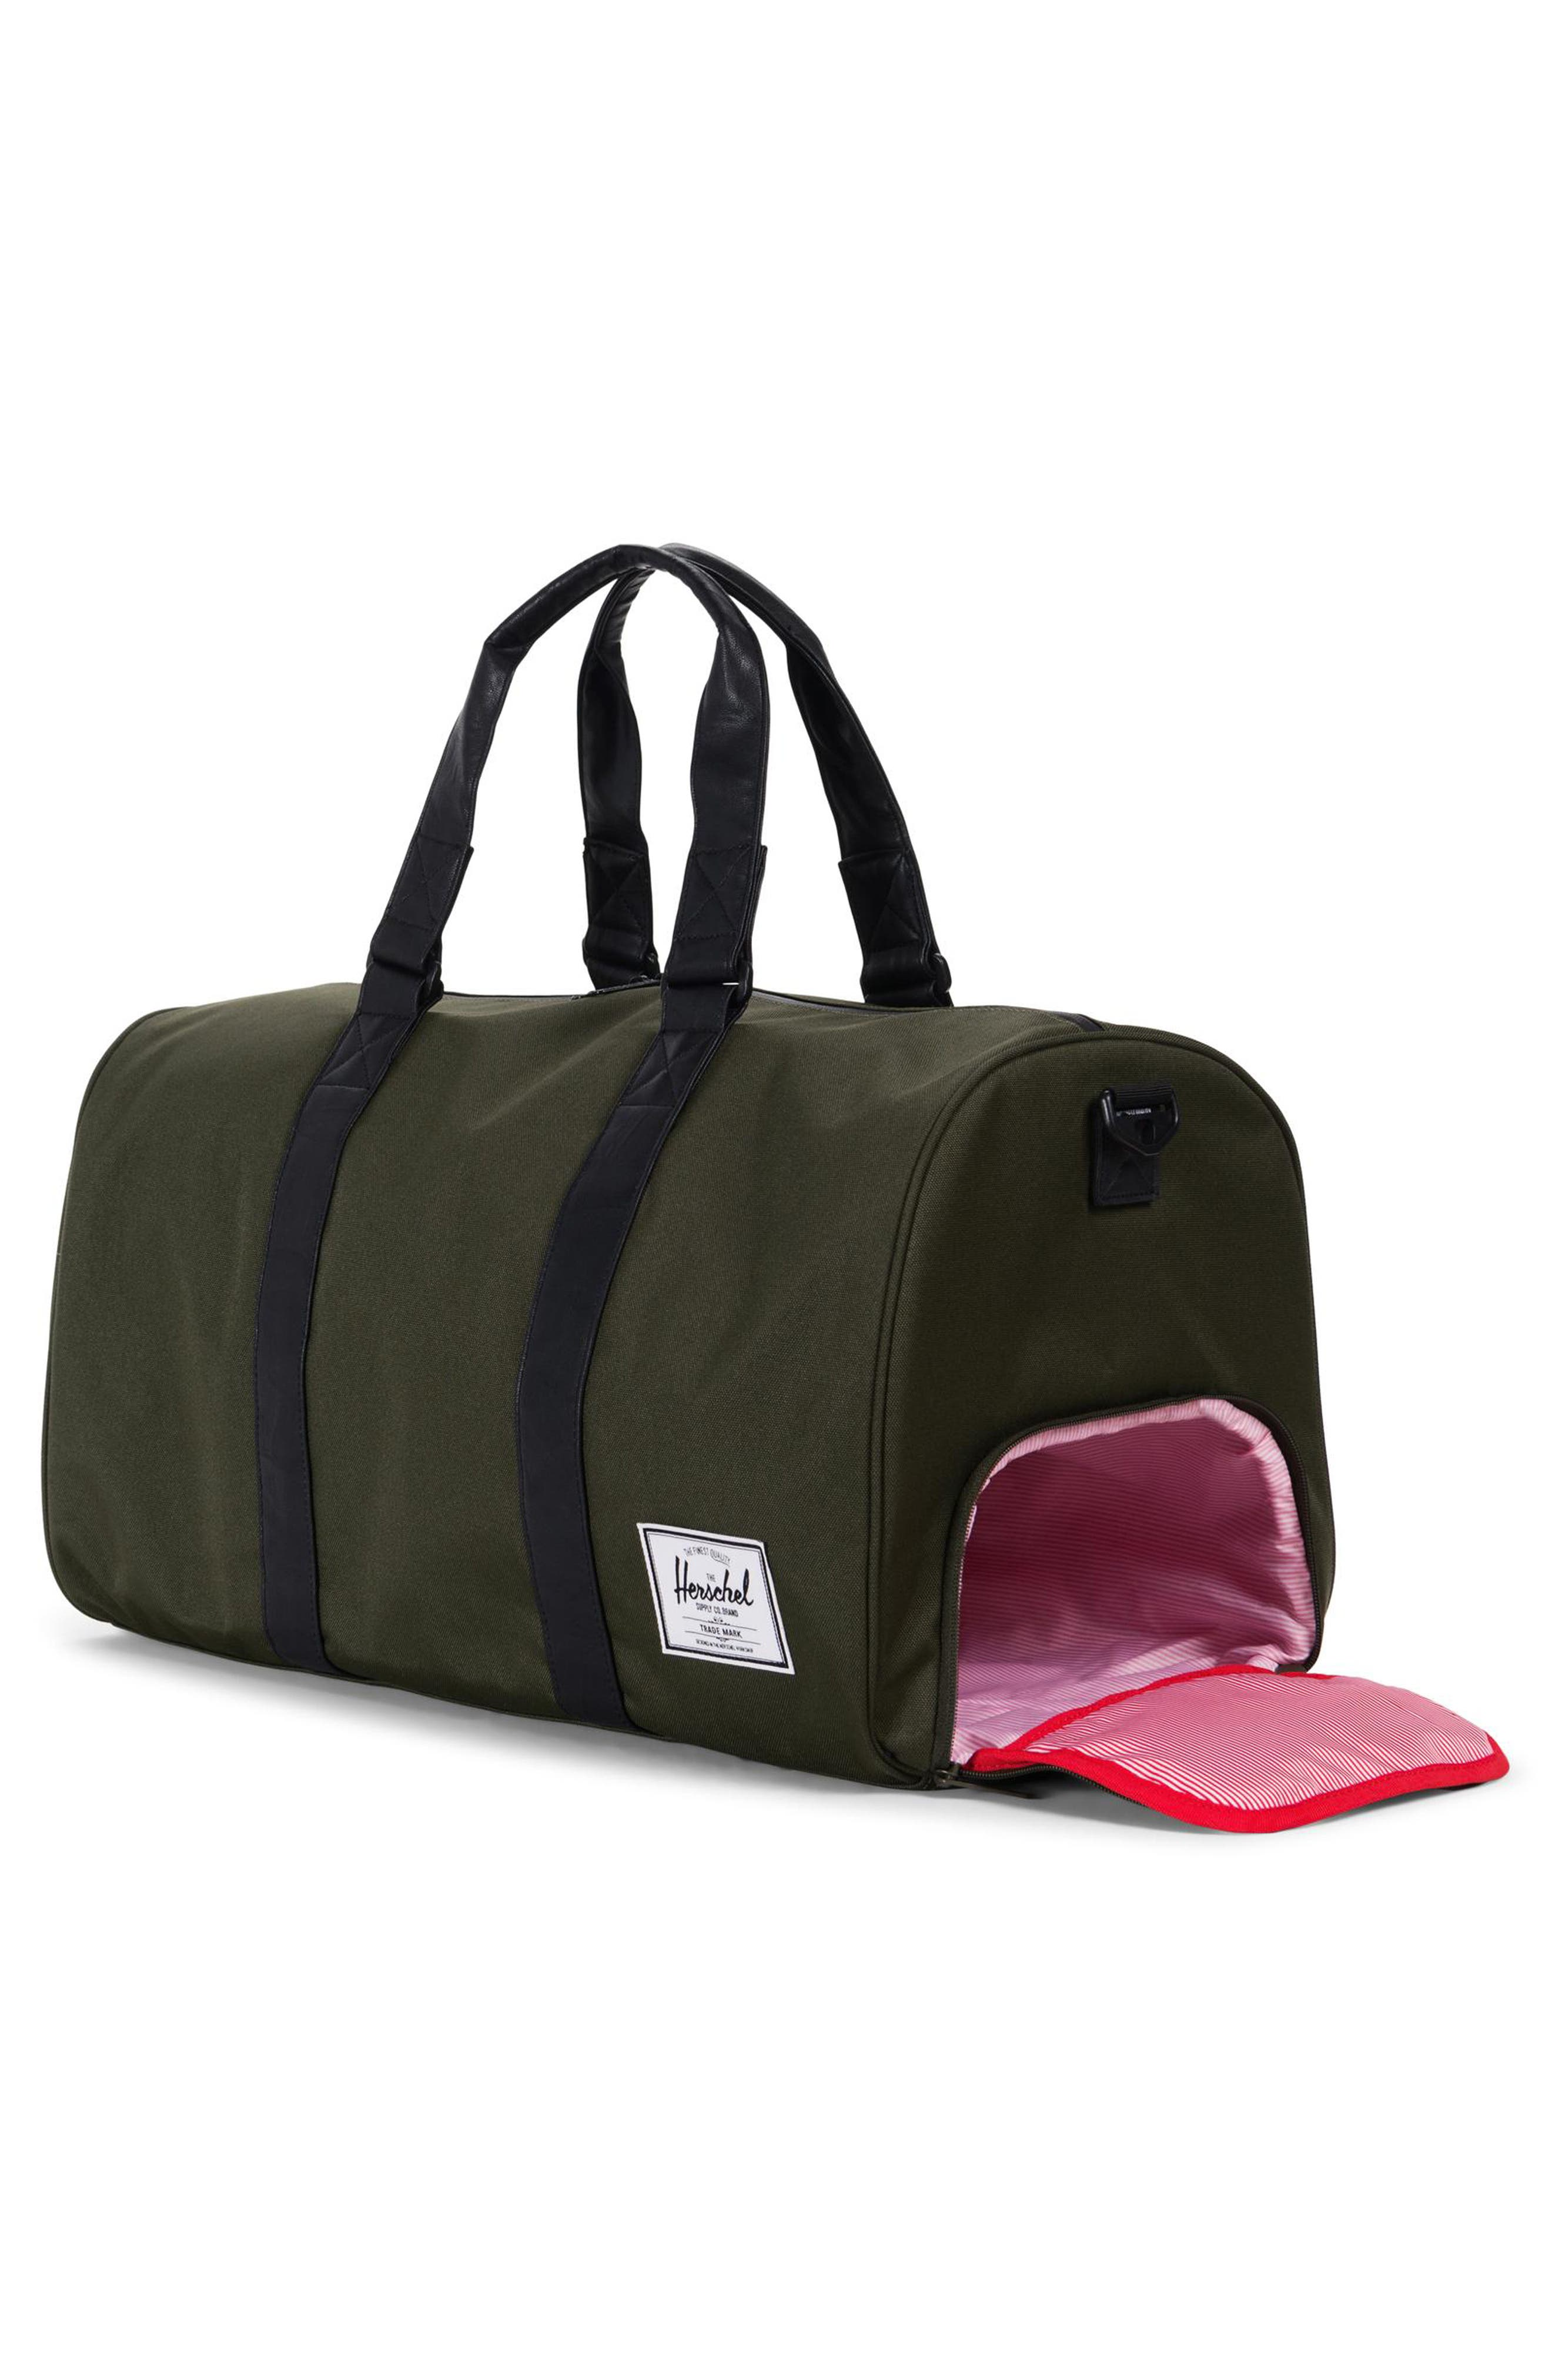 'Novel' Duffel Bag,                             Alternate thumbnail 3, color,                             300